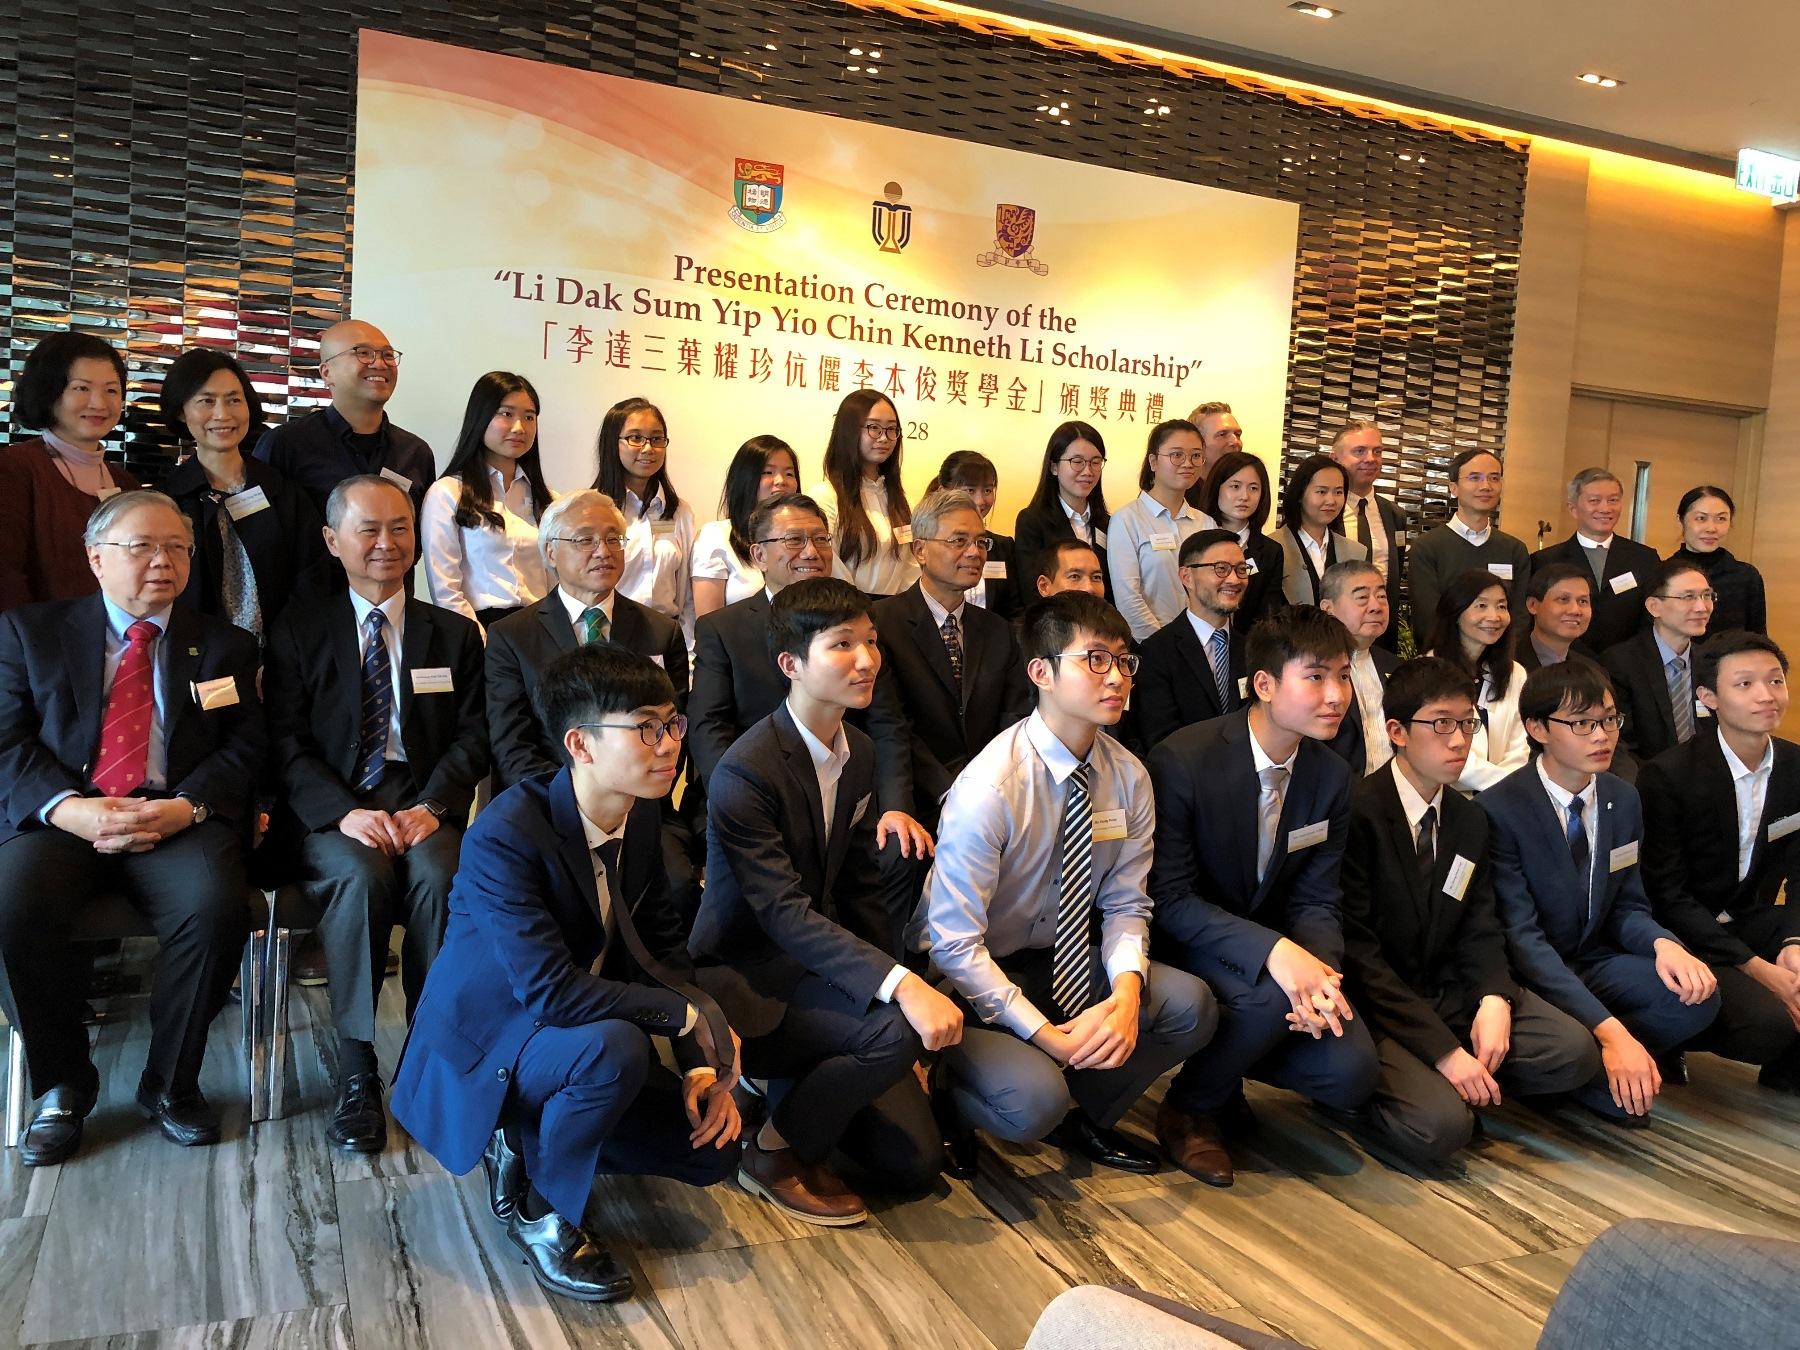 http://npc.edu.hk/sites/default/files/img_0524.jpg